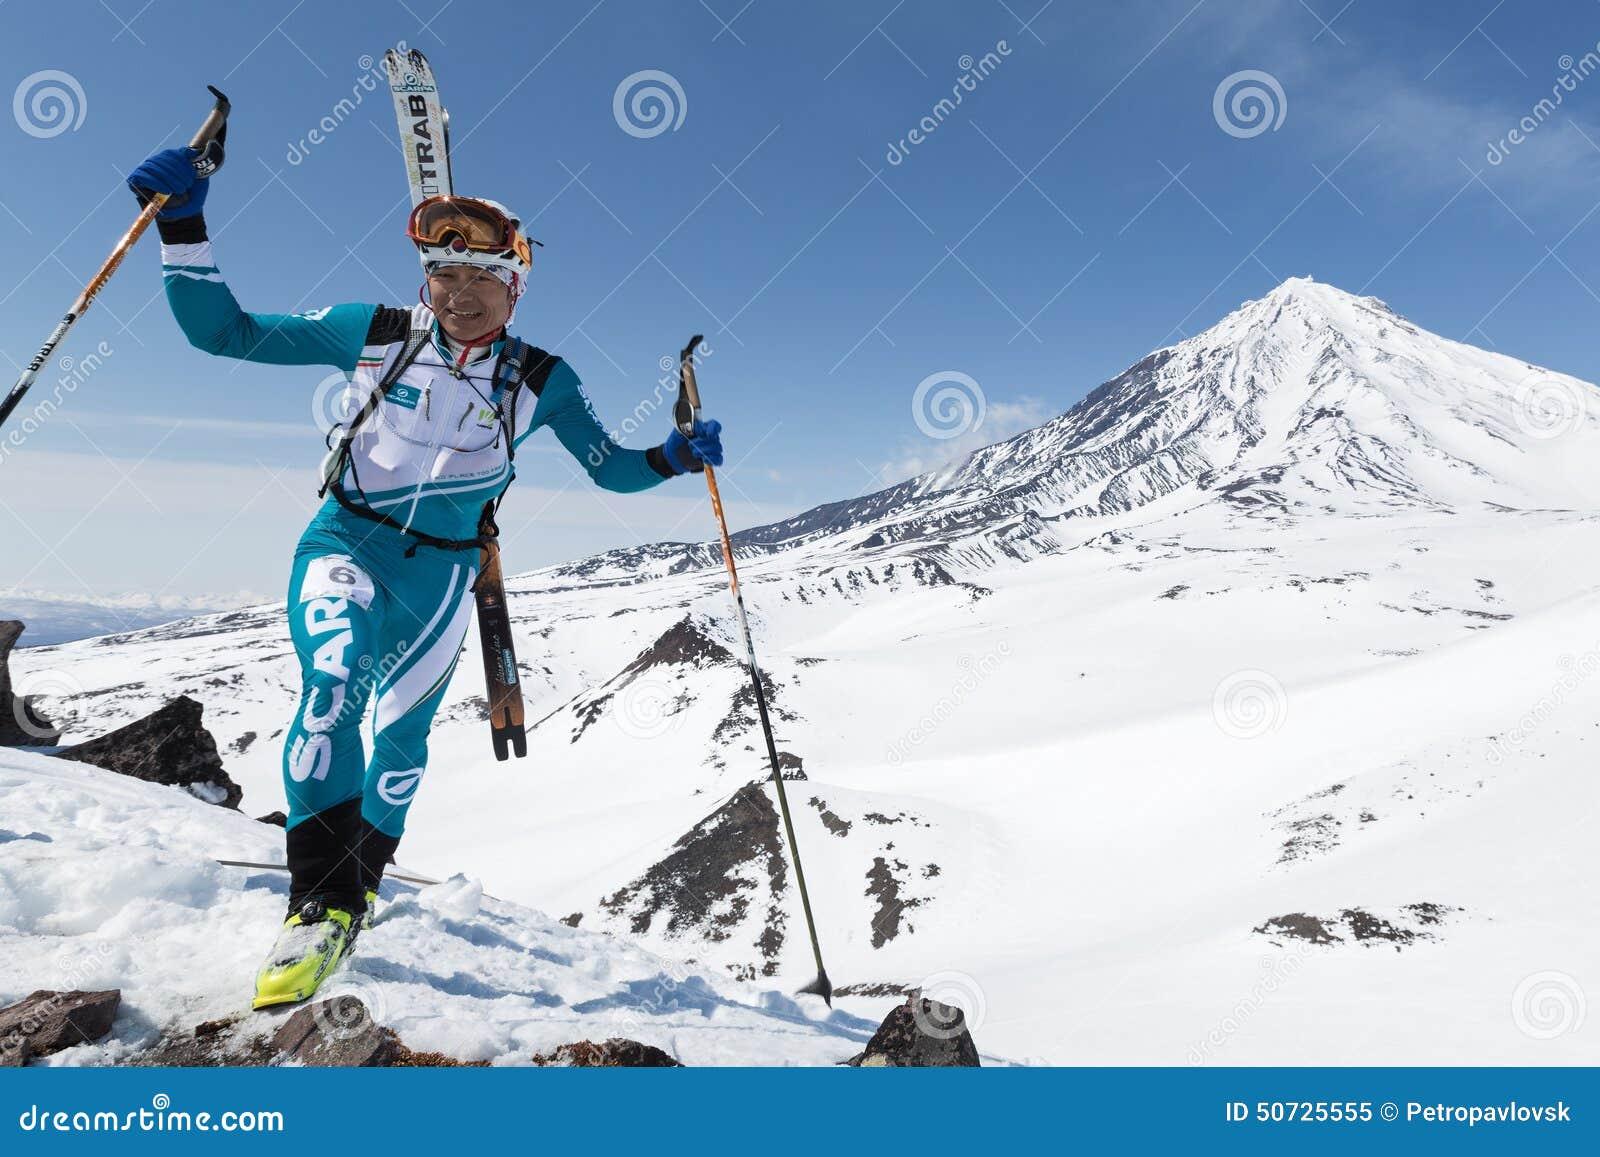 Ski Mountaineering Championships: Ski Mountaineer Climb To ...